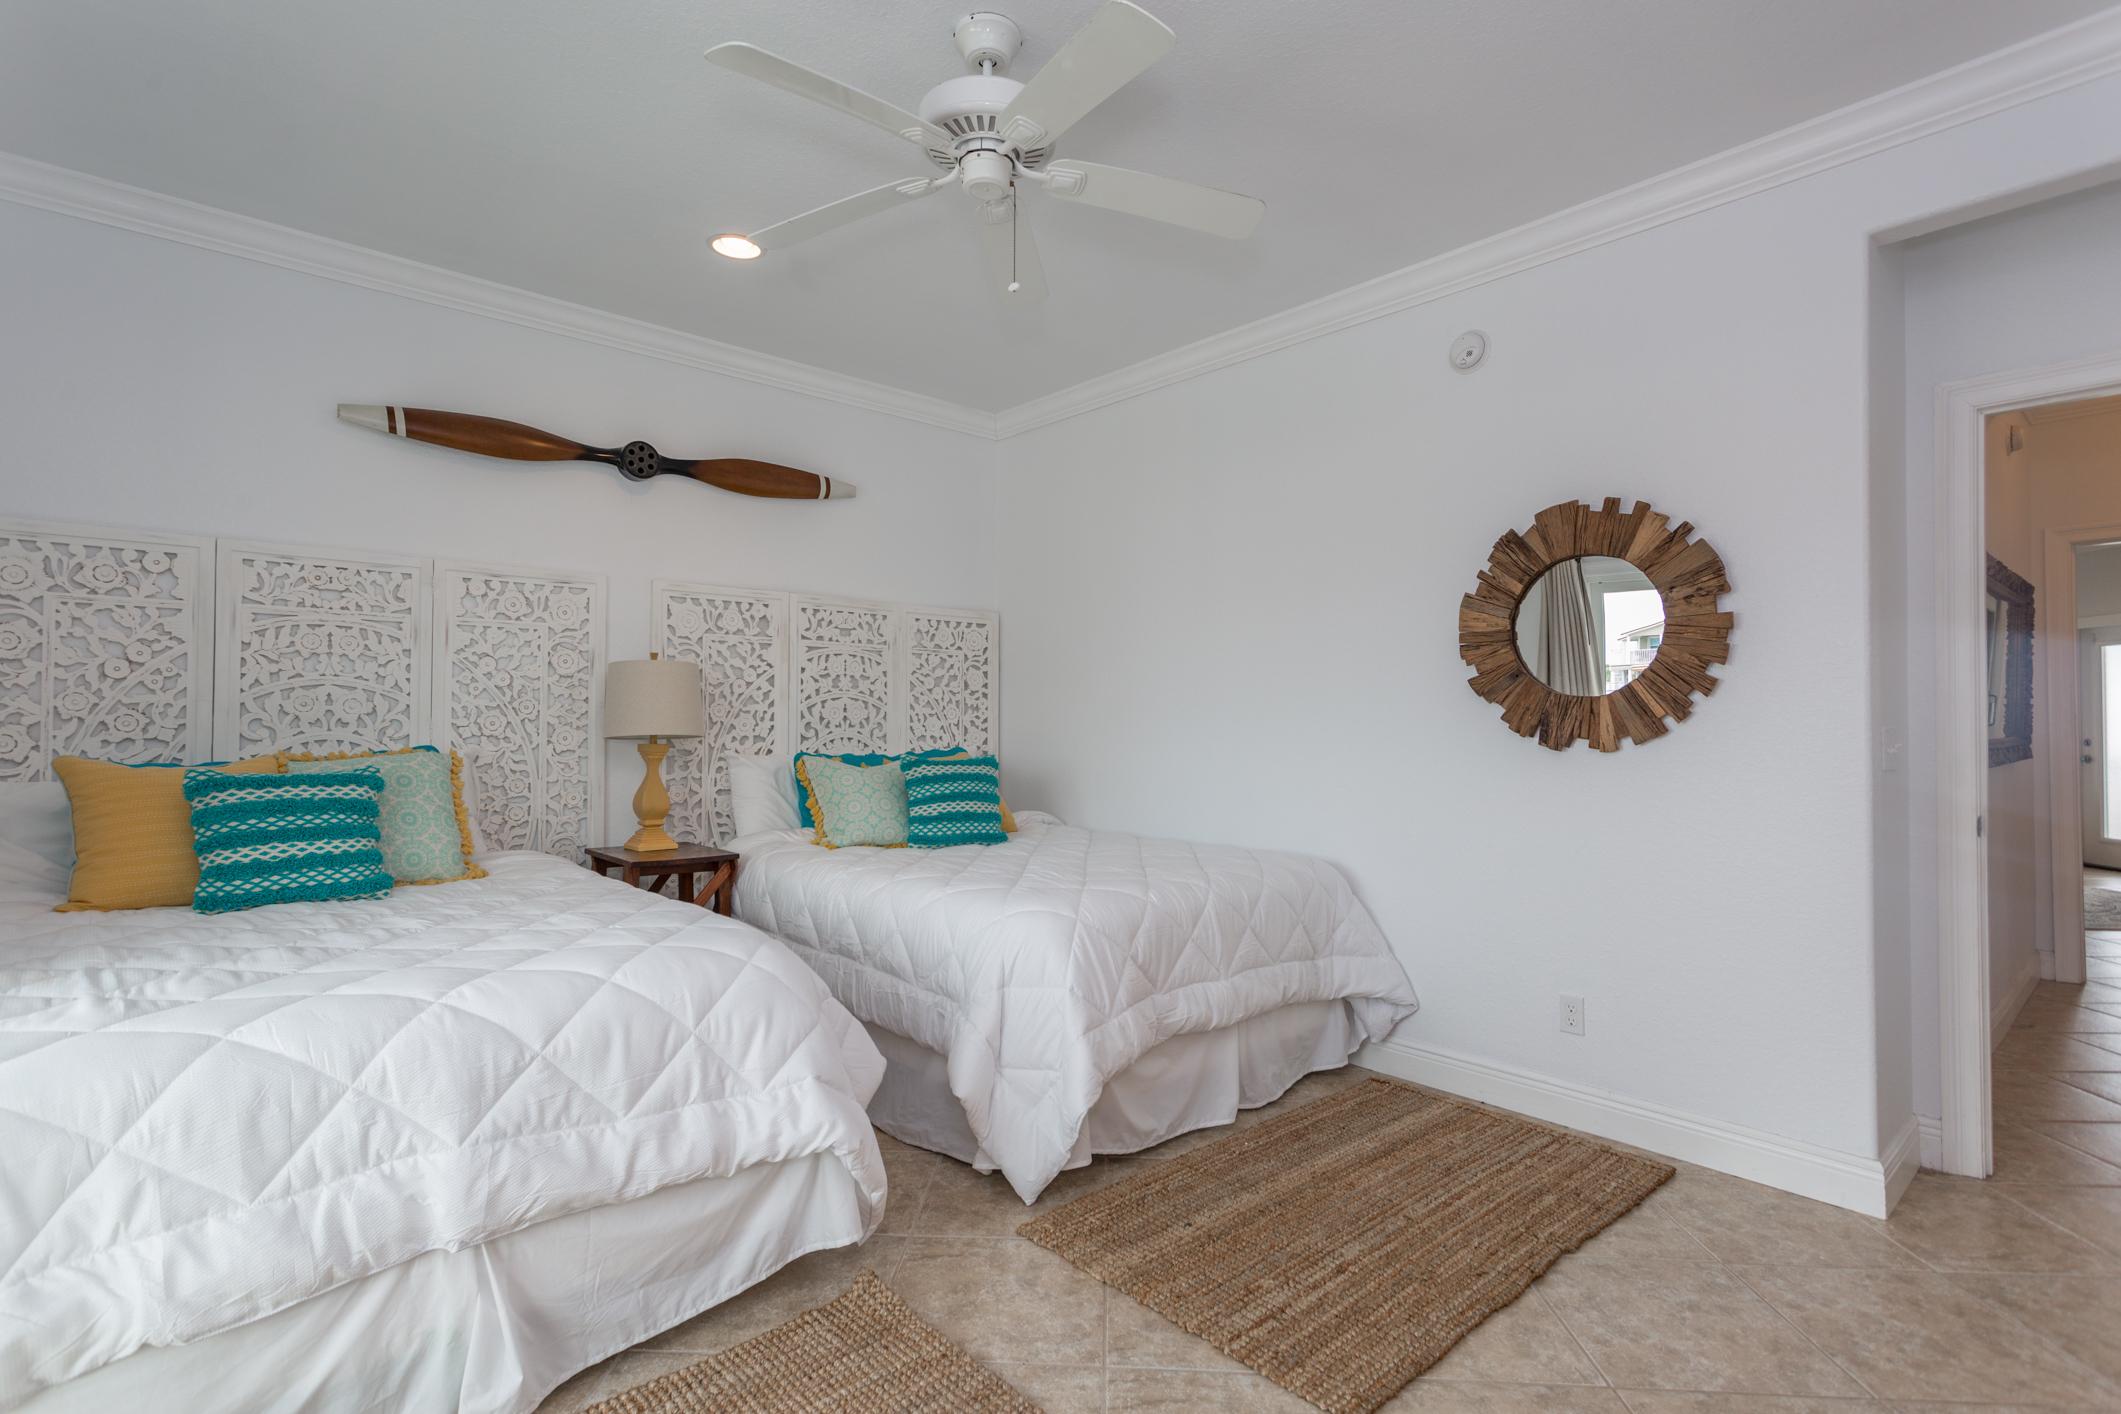 Ariola 1003 - The Starfish House House/Cottage rental in Pensacola Beach House Rentals in Pensacola Beach Florida - #36